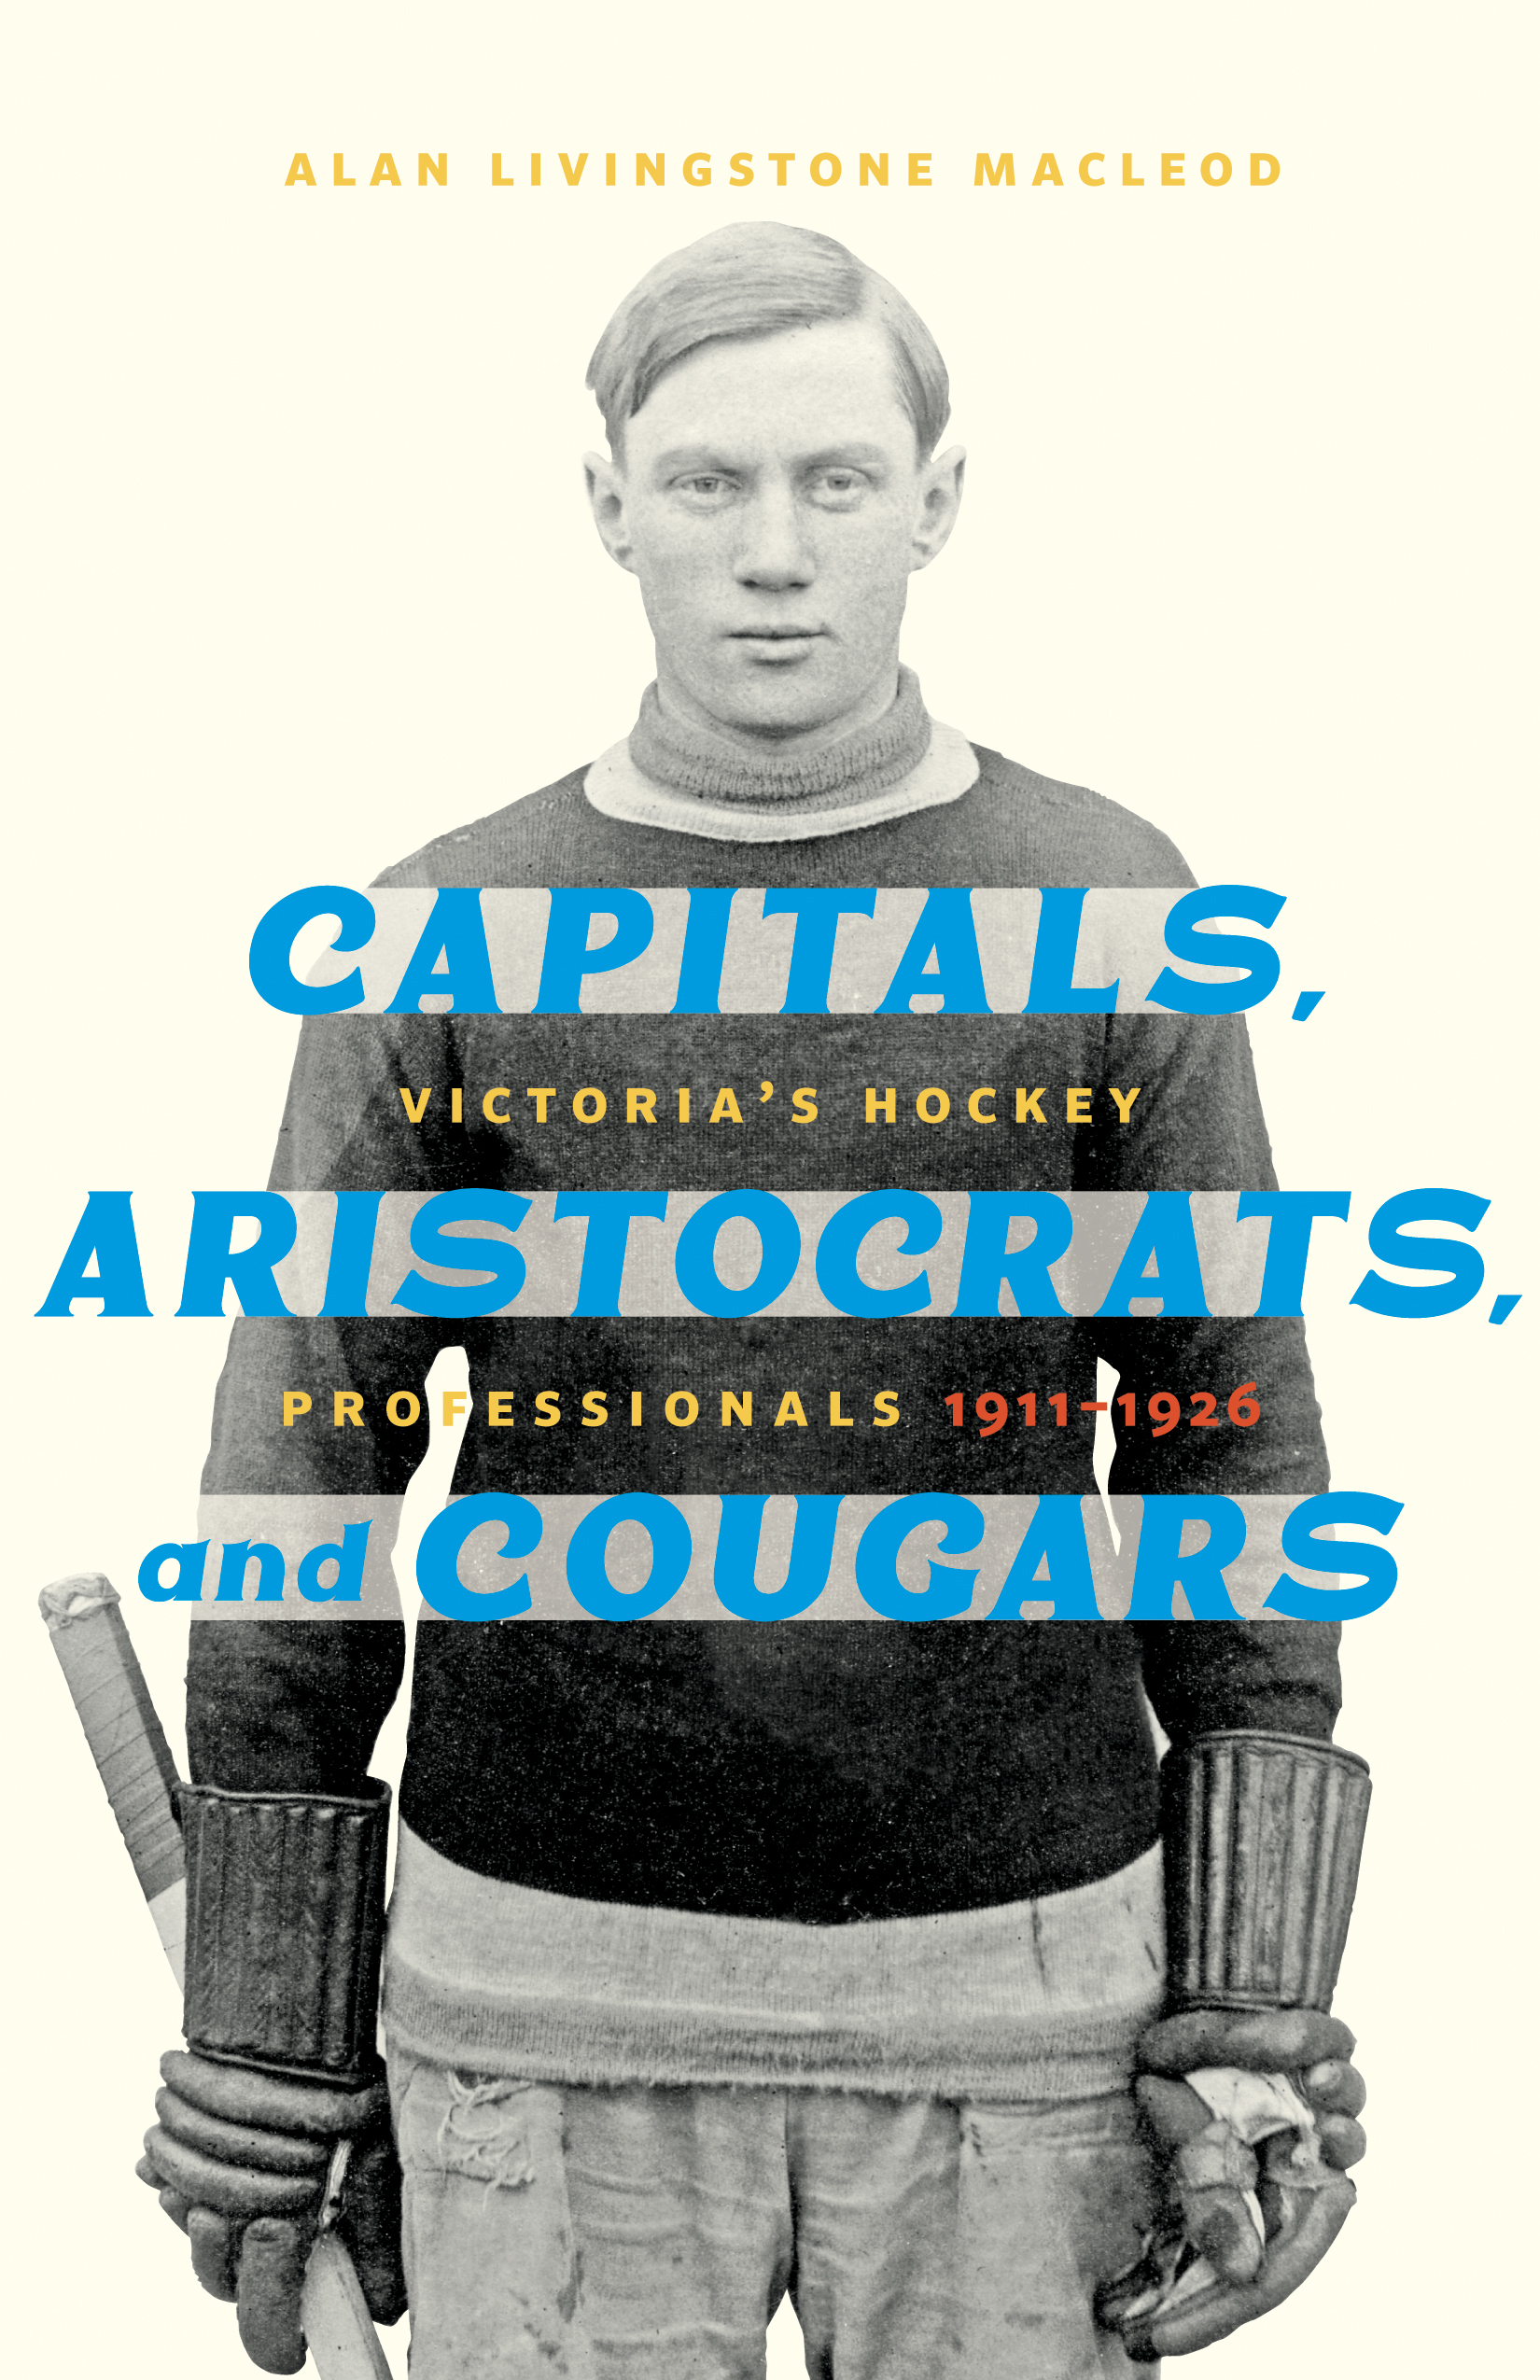 Capitals, Aristocrats, and Cougars